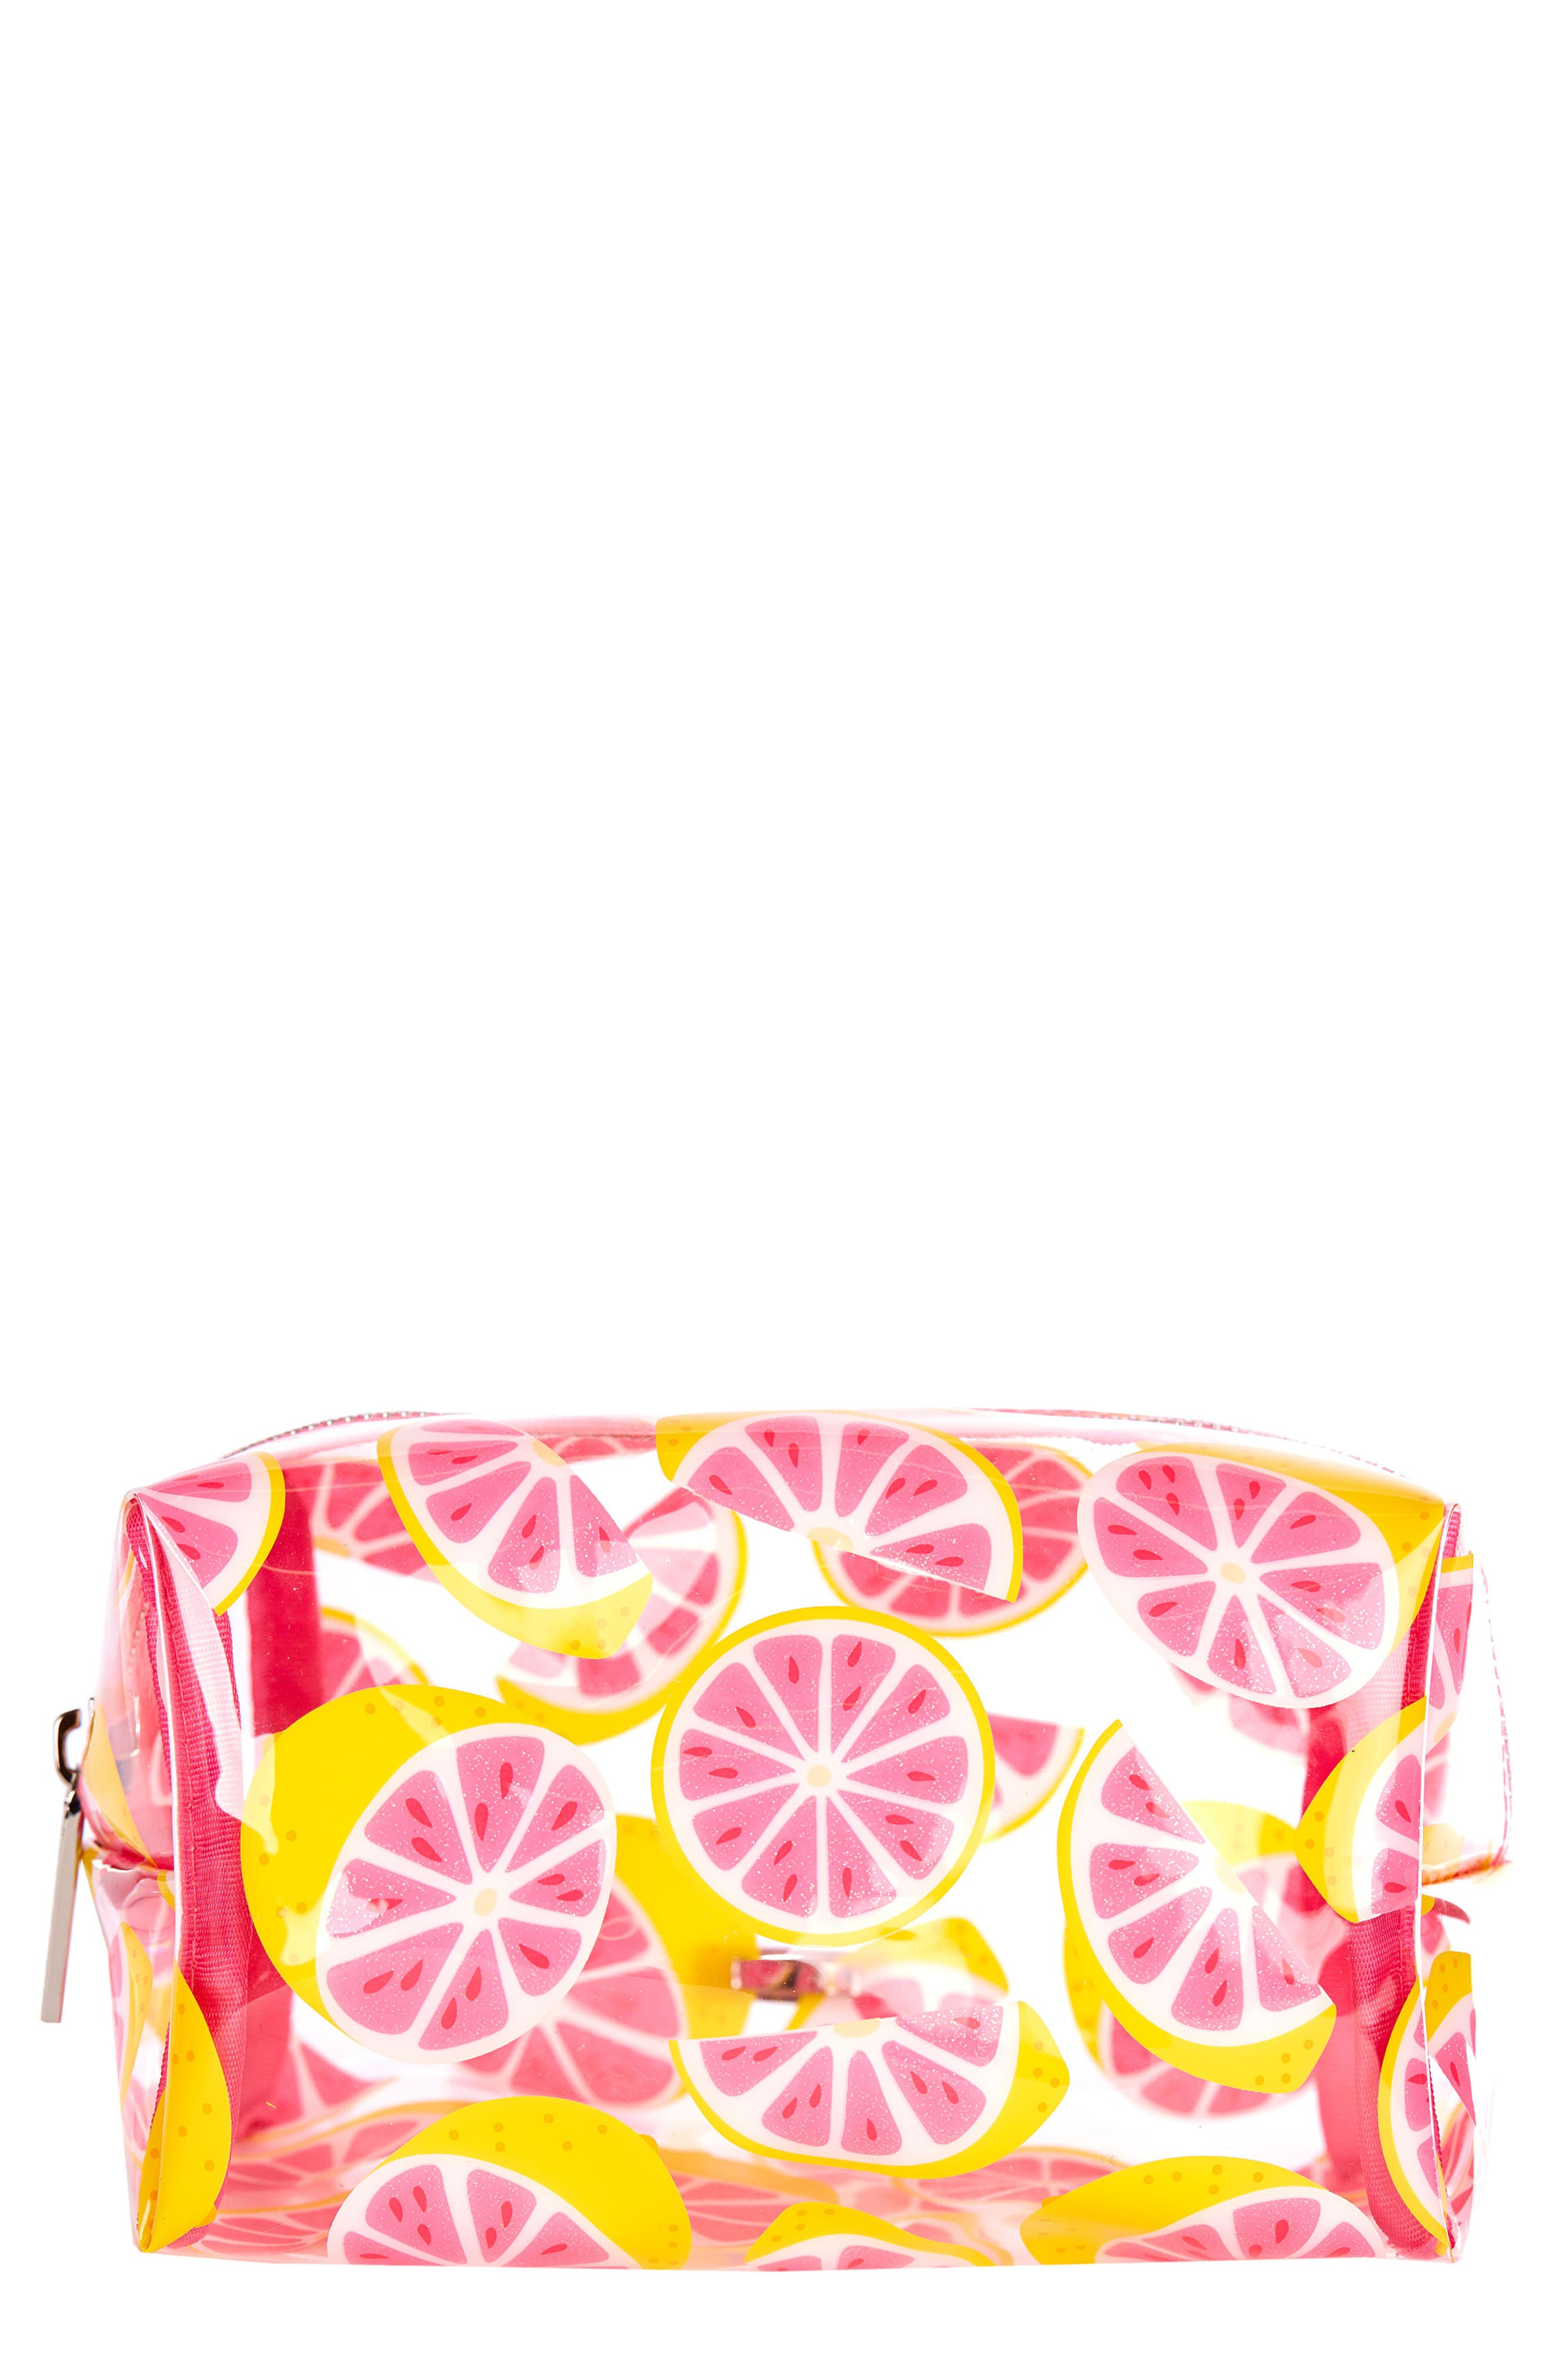 Skinny Dip Glitter Grapefruit Cosmetics Case,                         Main,                         color, NO COLOR